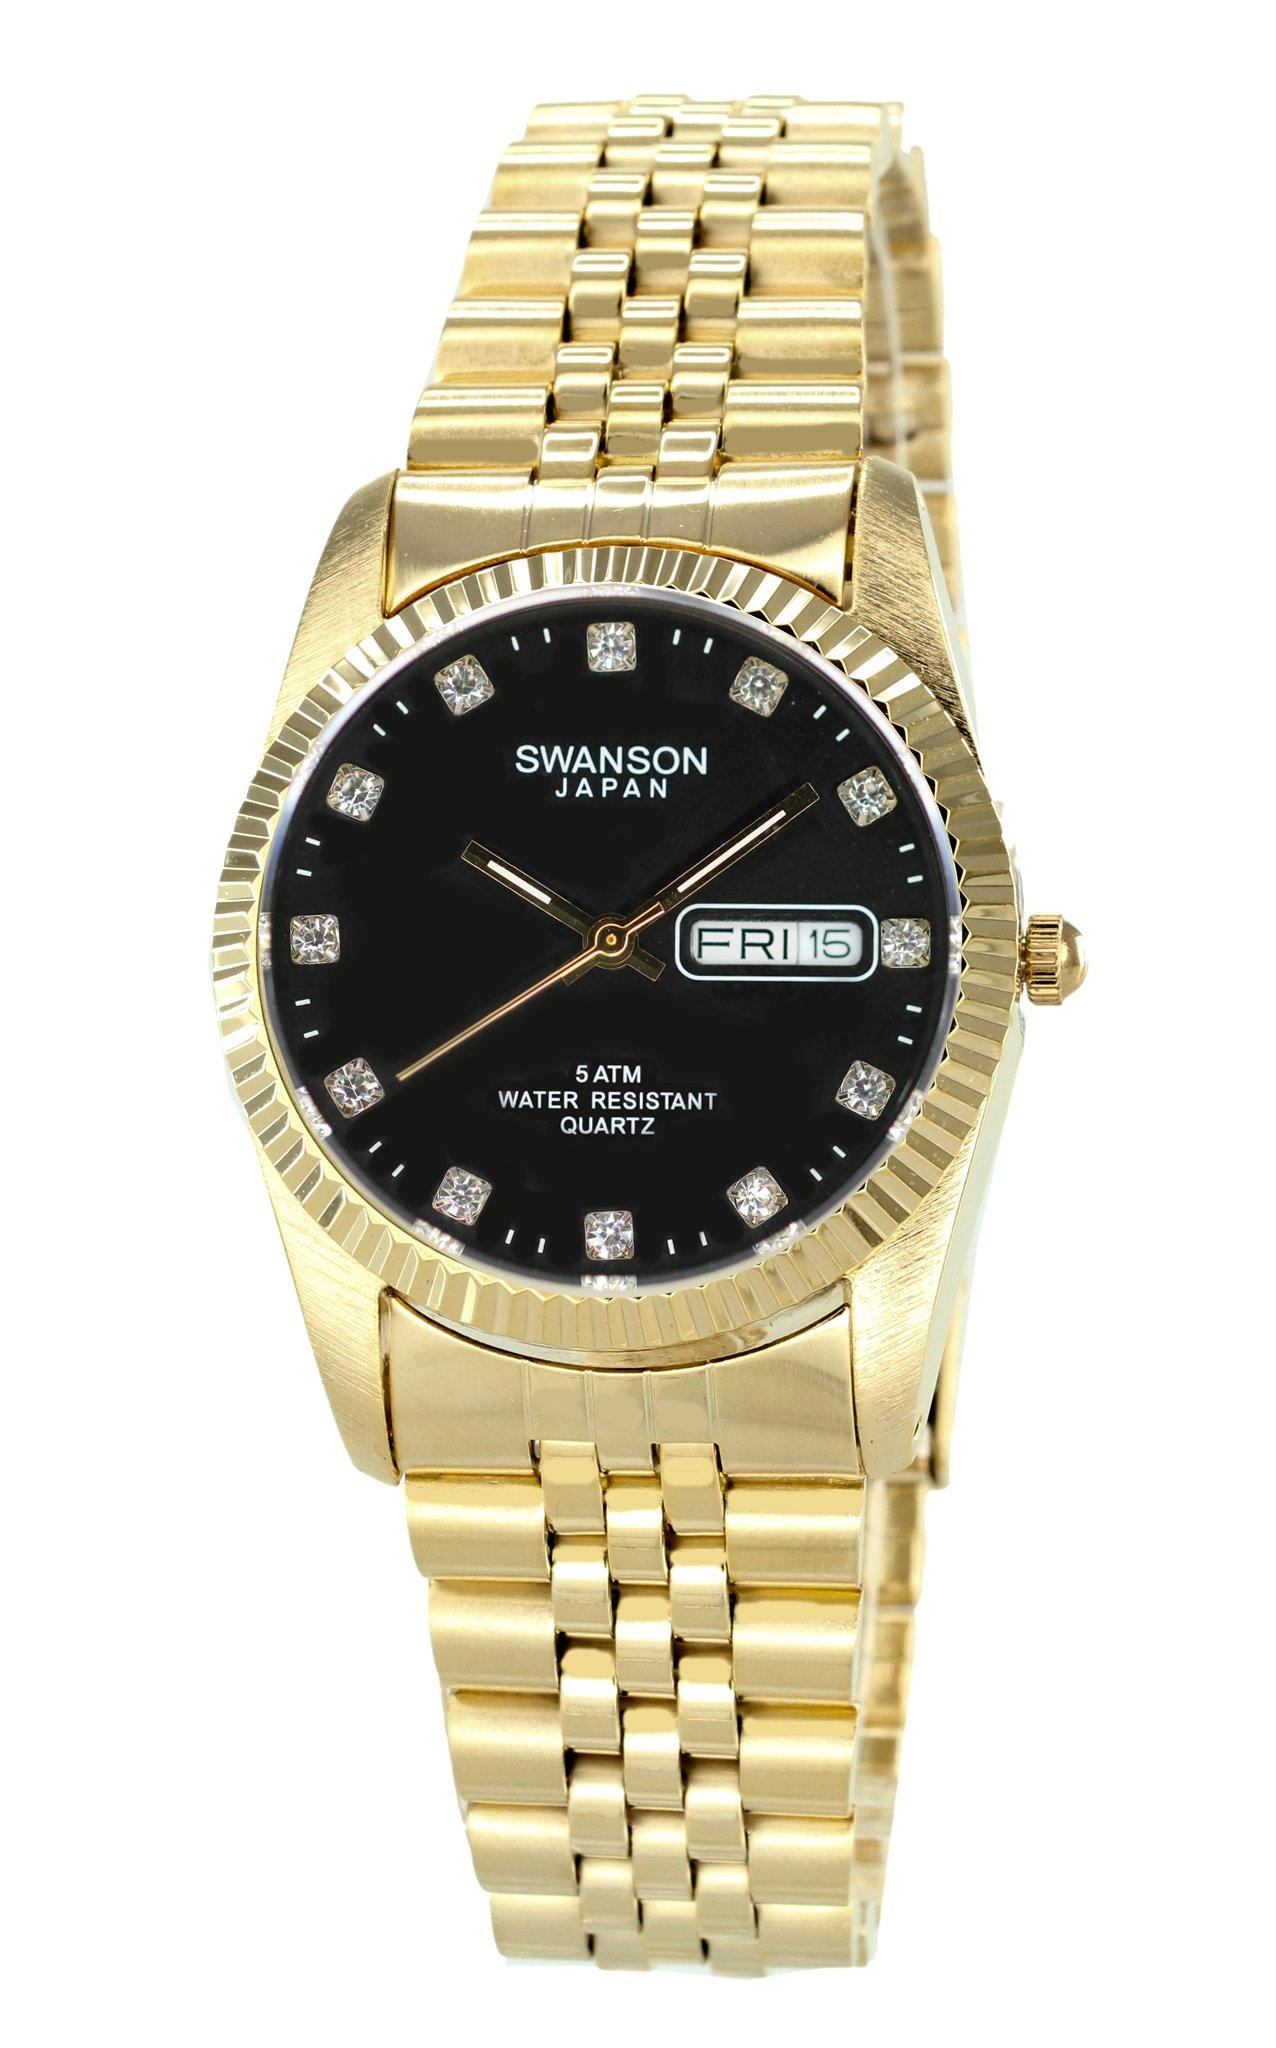 Swanson Men's Gold Day-Date Watch & Zipper Travel Gym Case